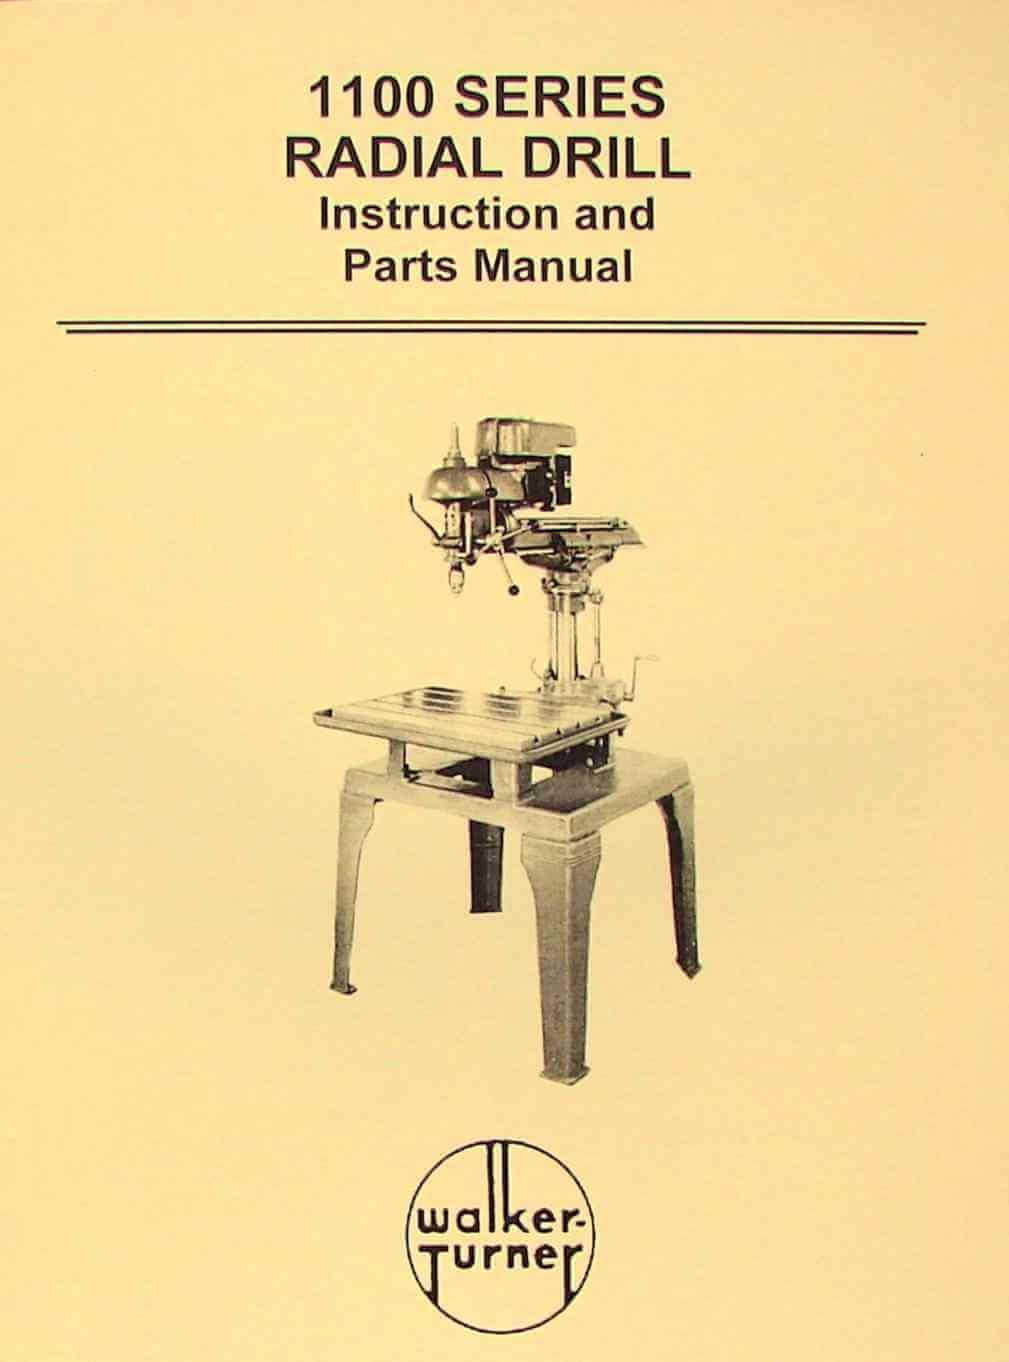 WALKER TURNER 1100 Series Radial Drill Operator's & Parts Manual   Ozark  Tool Manuals & Books